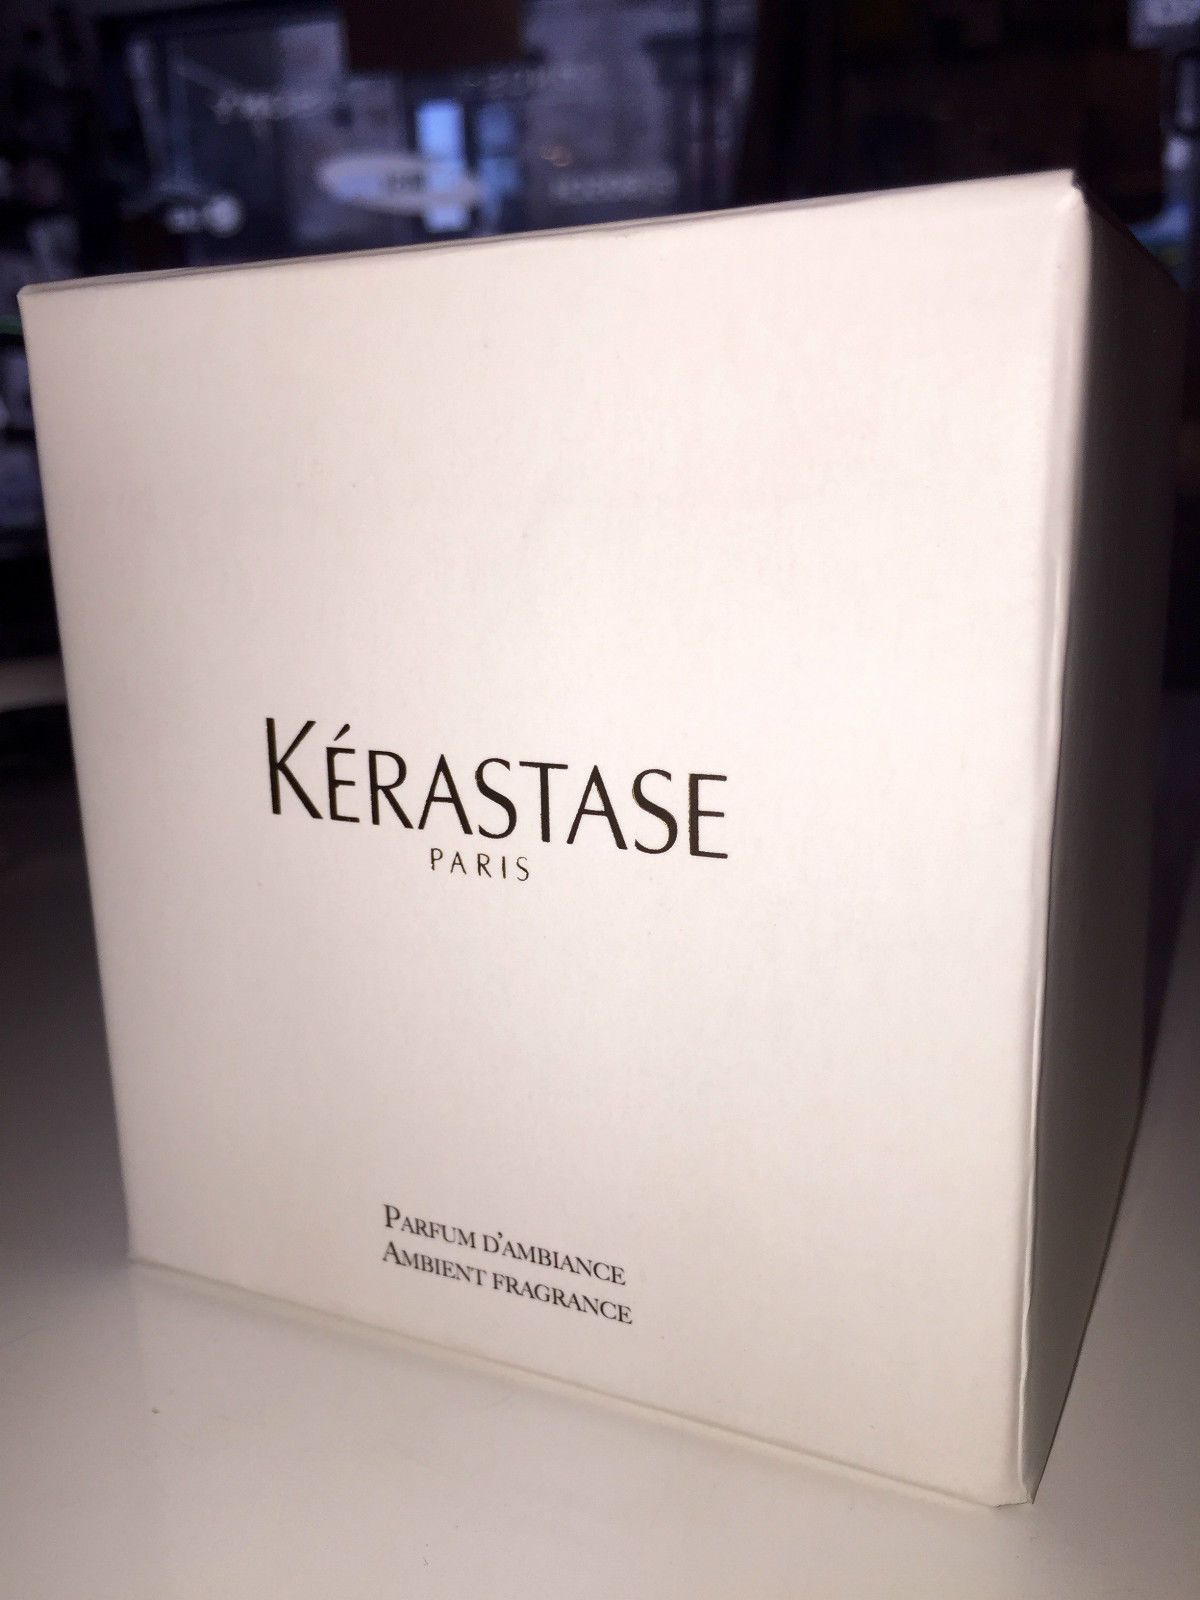 KERASTASE PARFUM D'AMBIENCE (200ml) LIMITED EDITION